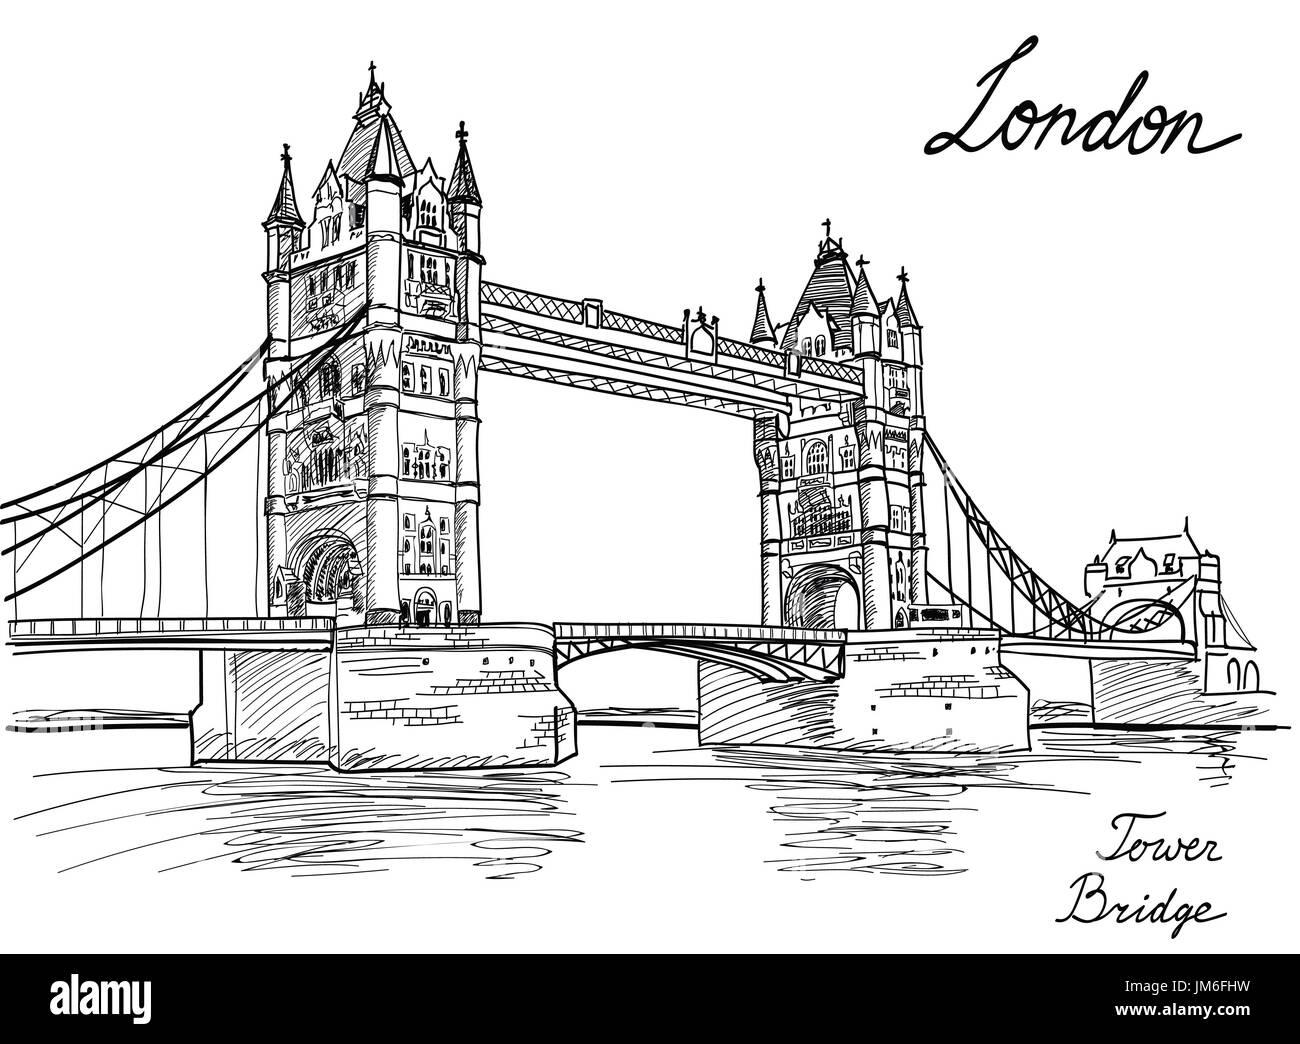 Tower Bridge, London, England, UK, Europe. Hand drawing old fashion illustration background with copy space. - Stock Image